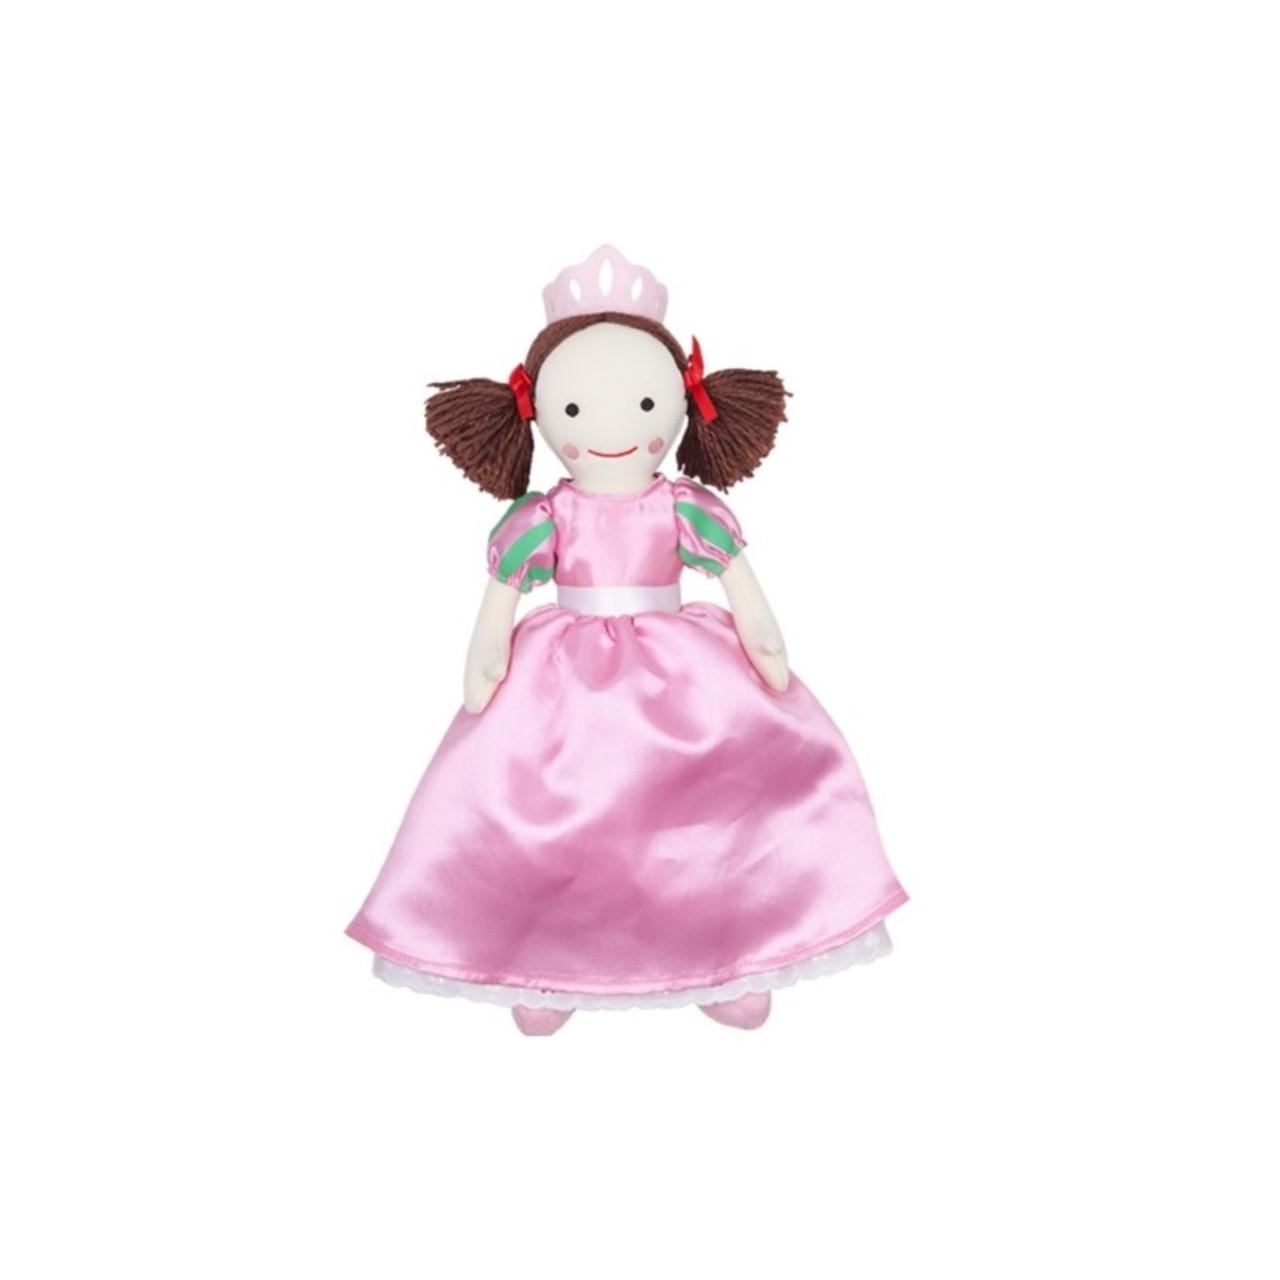 Play School Jemima Princess Plush Soft Toy 32cm Doll